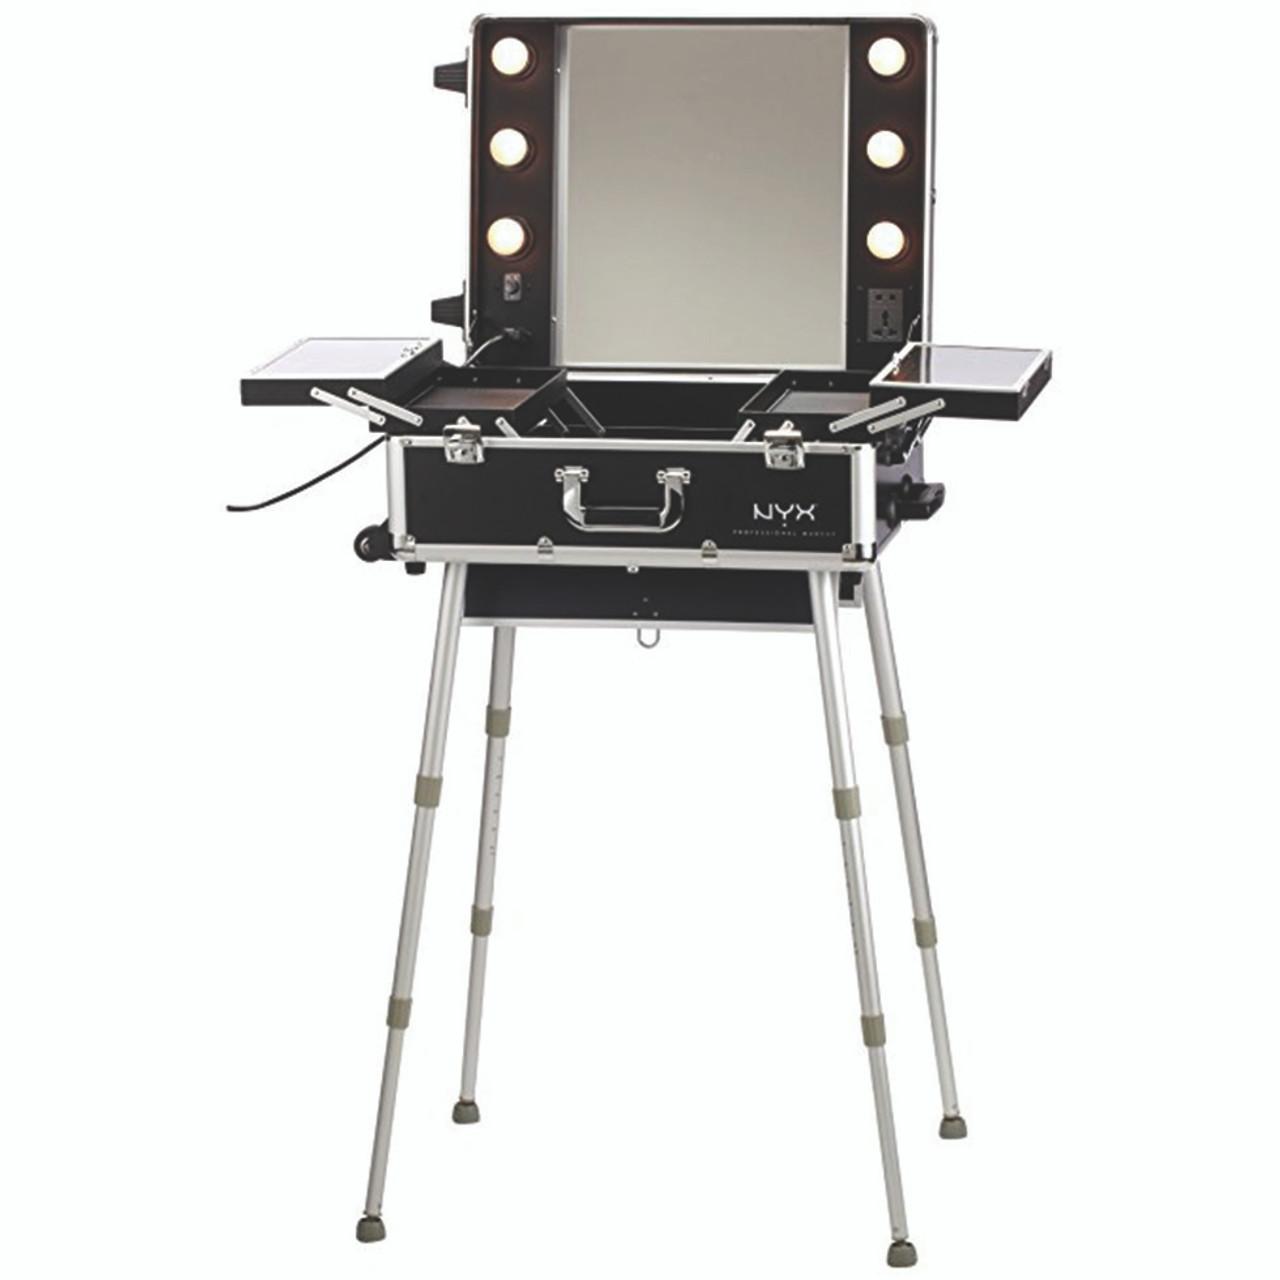 Rental - Make Up Station (Telescoping Legs w/Lights)